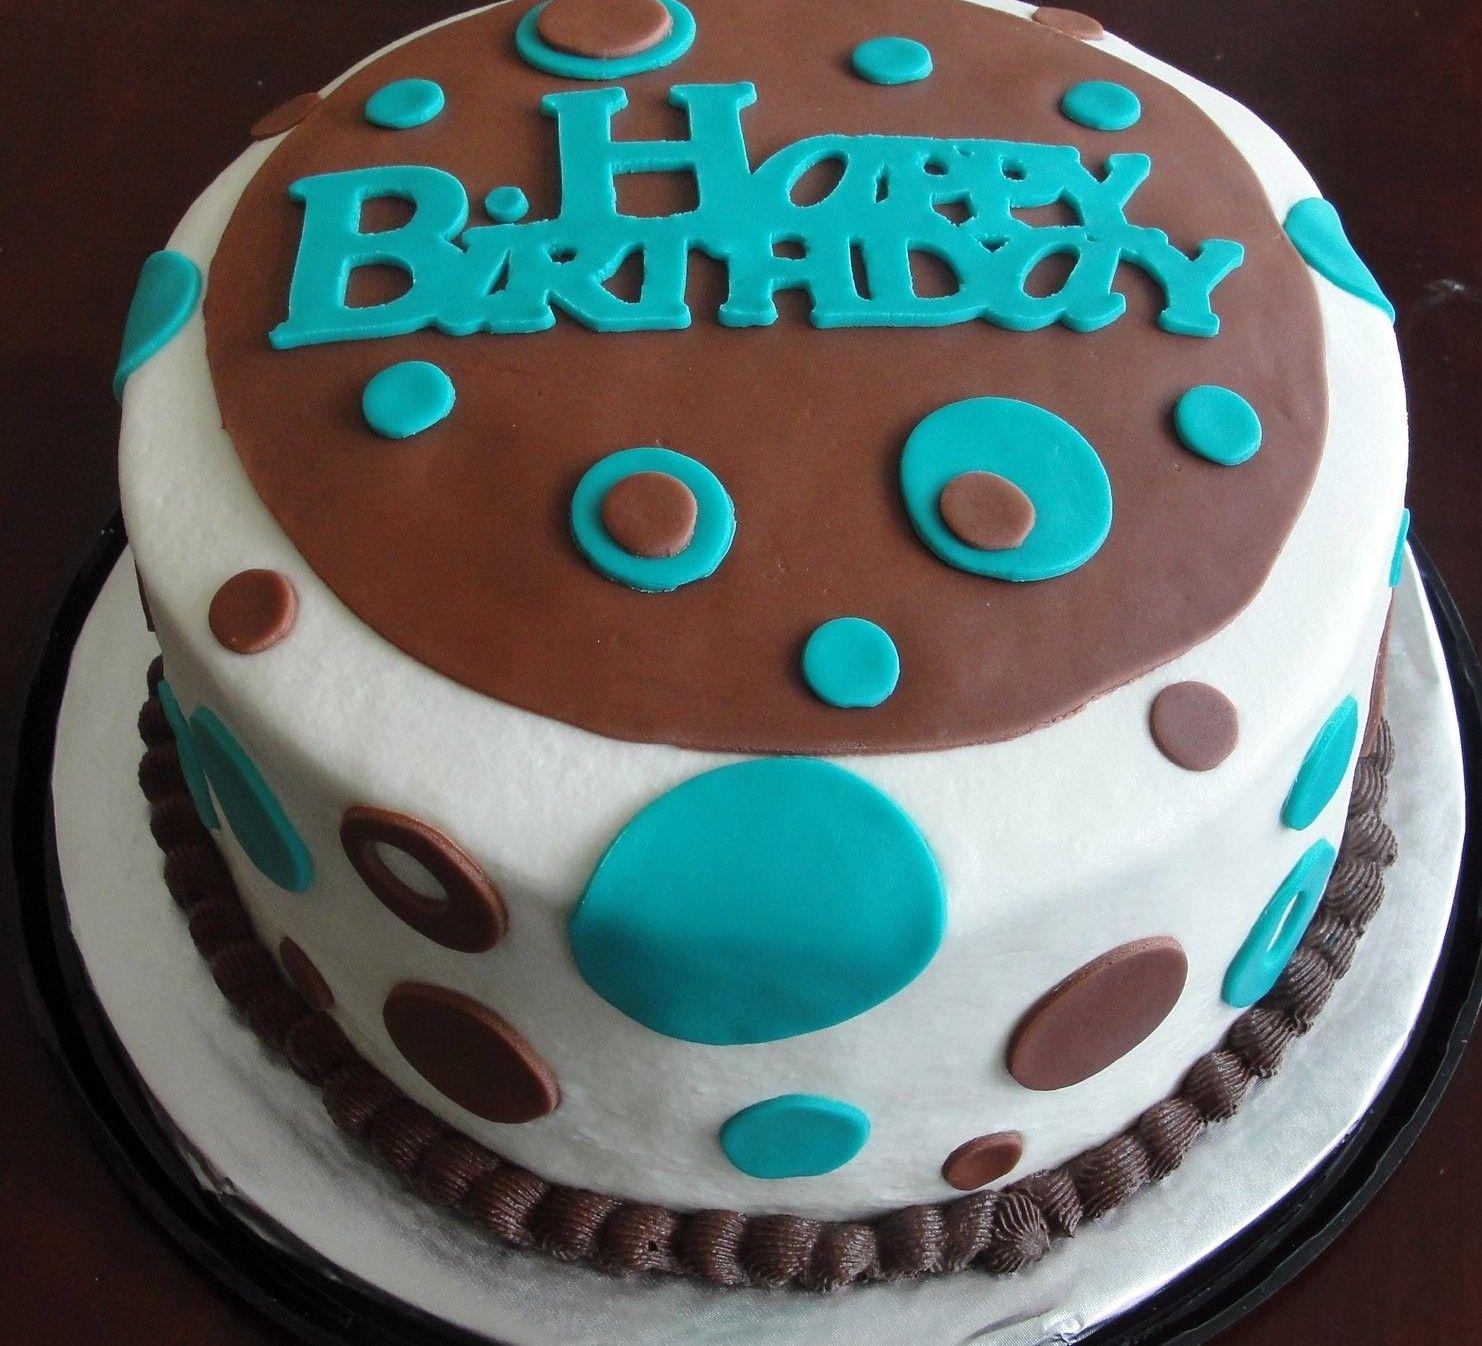 custombirthdaycakescrz2vh2qjpg 14821346 birthday cakes